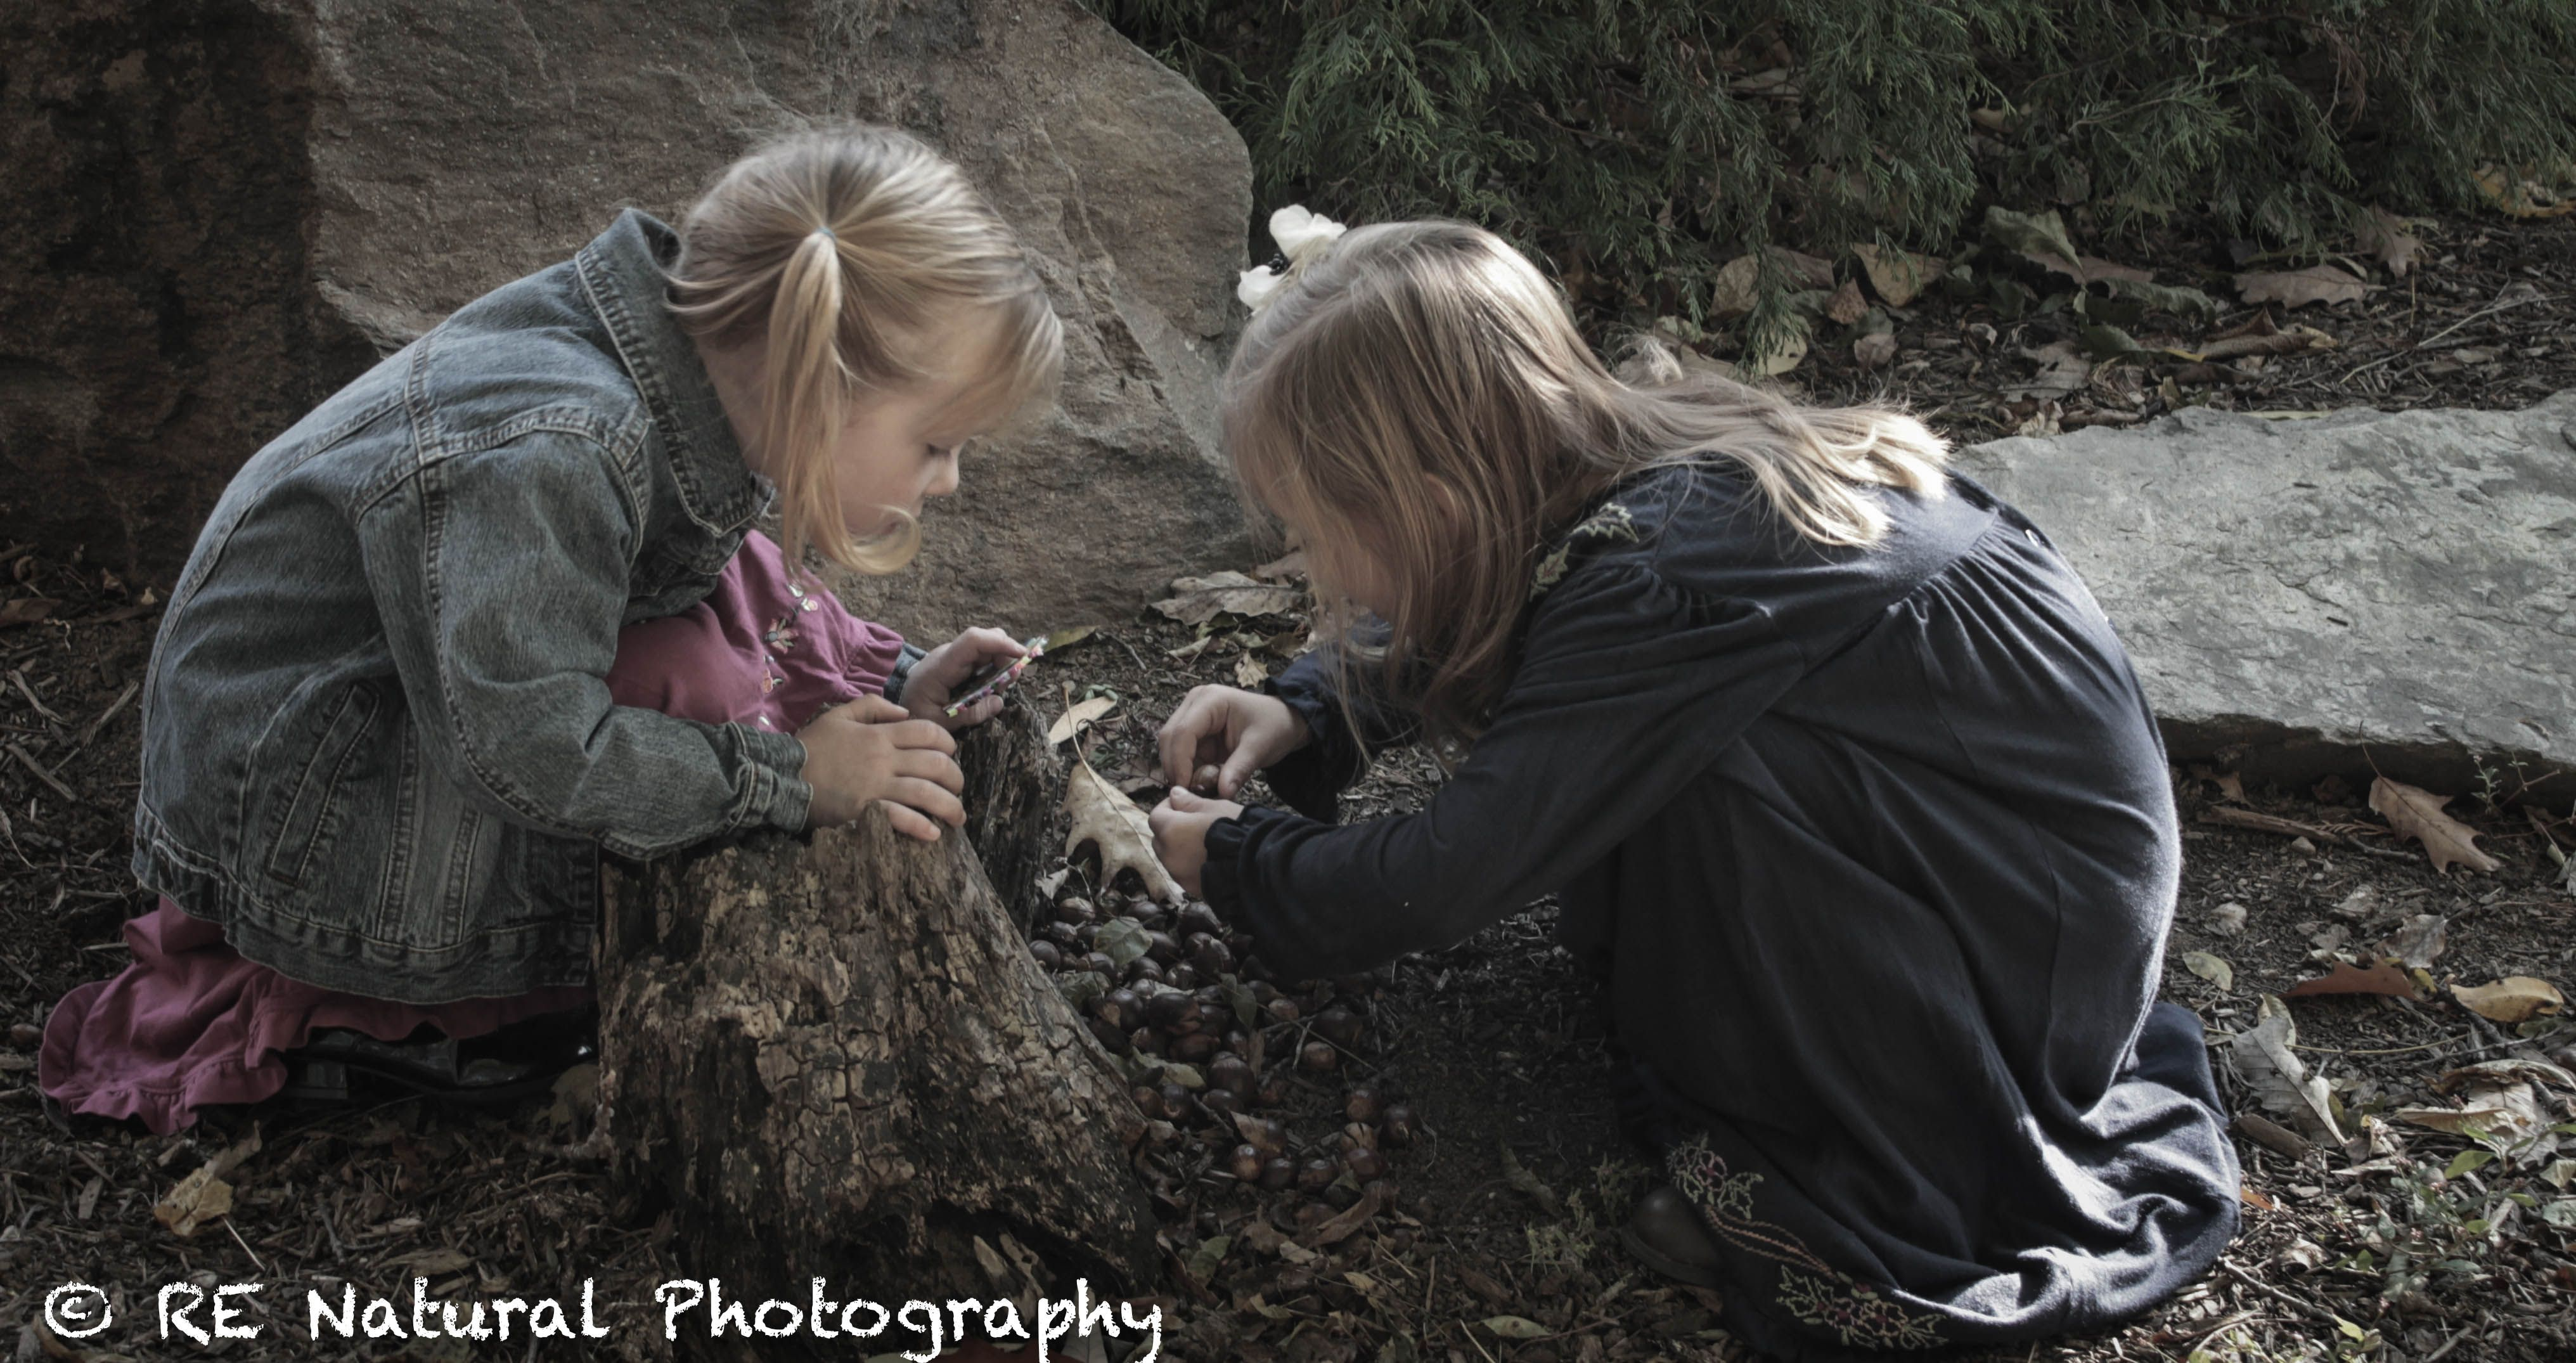 www.renaturalphotography.com Magical